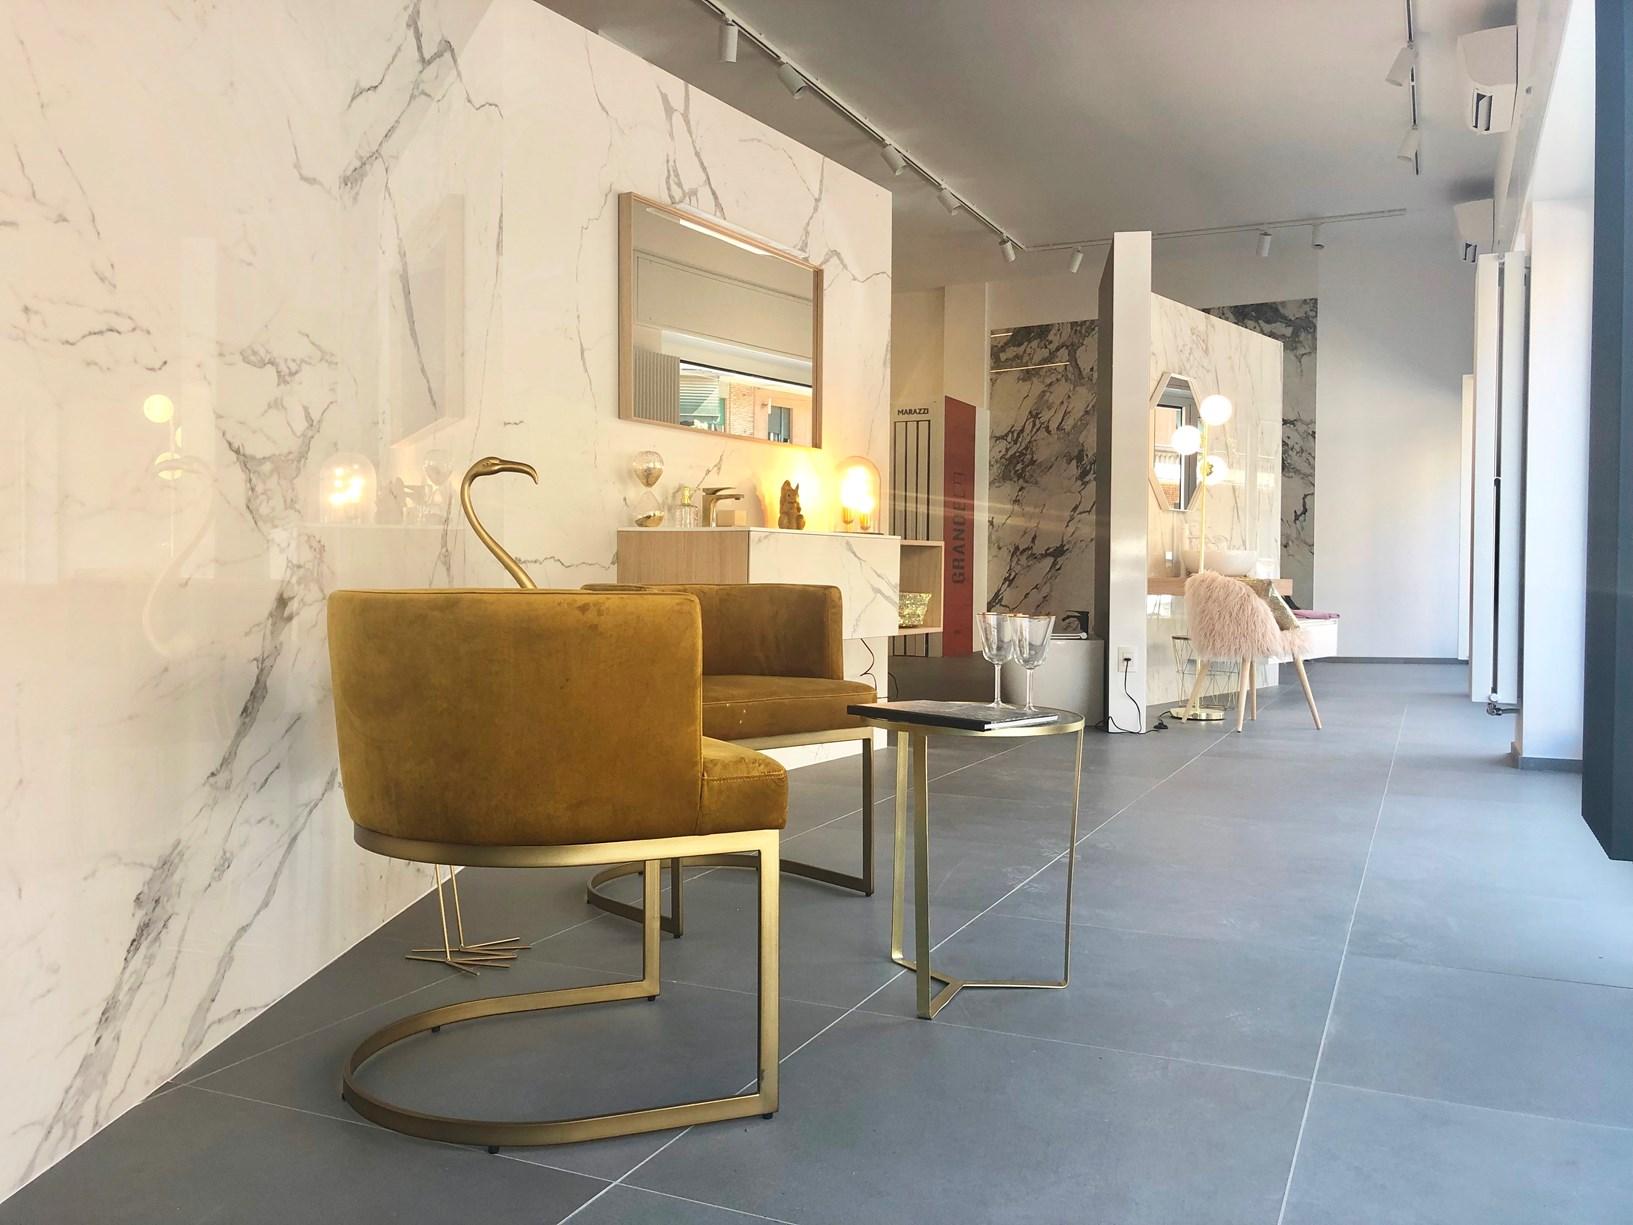 4BILD MILANO SAN SIRO Showroom